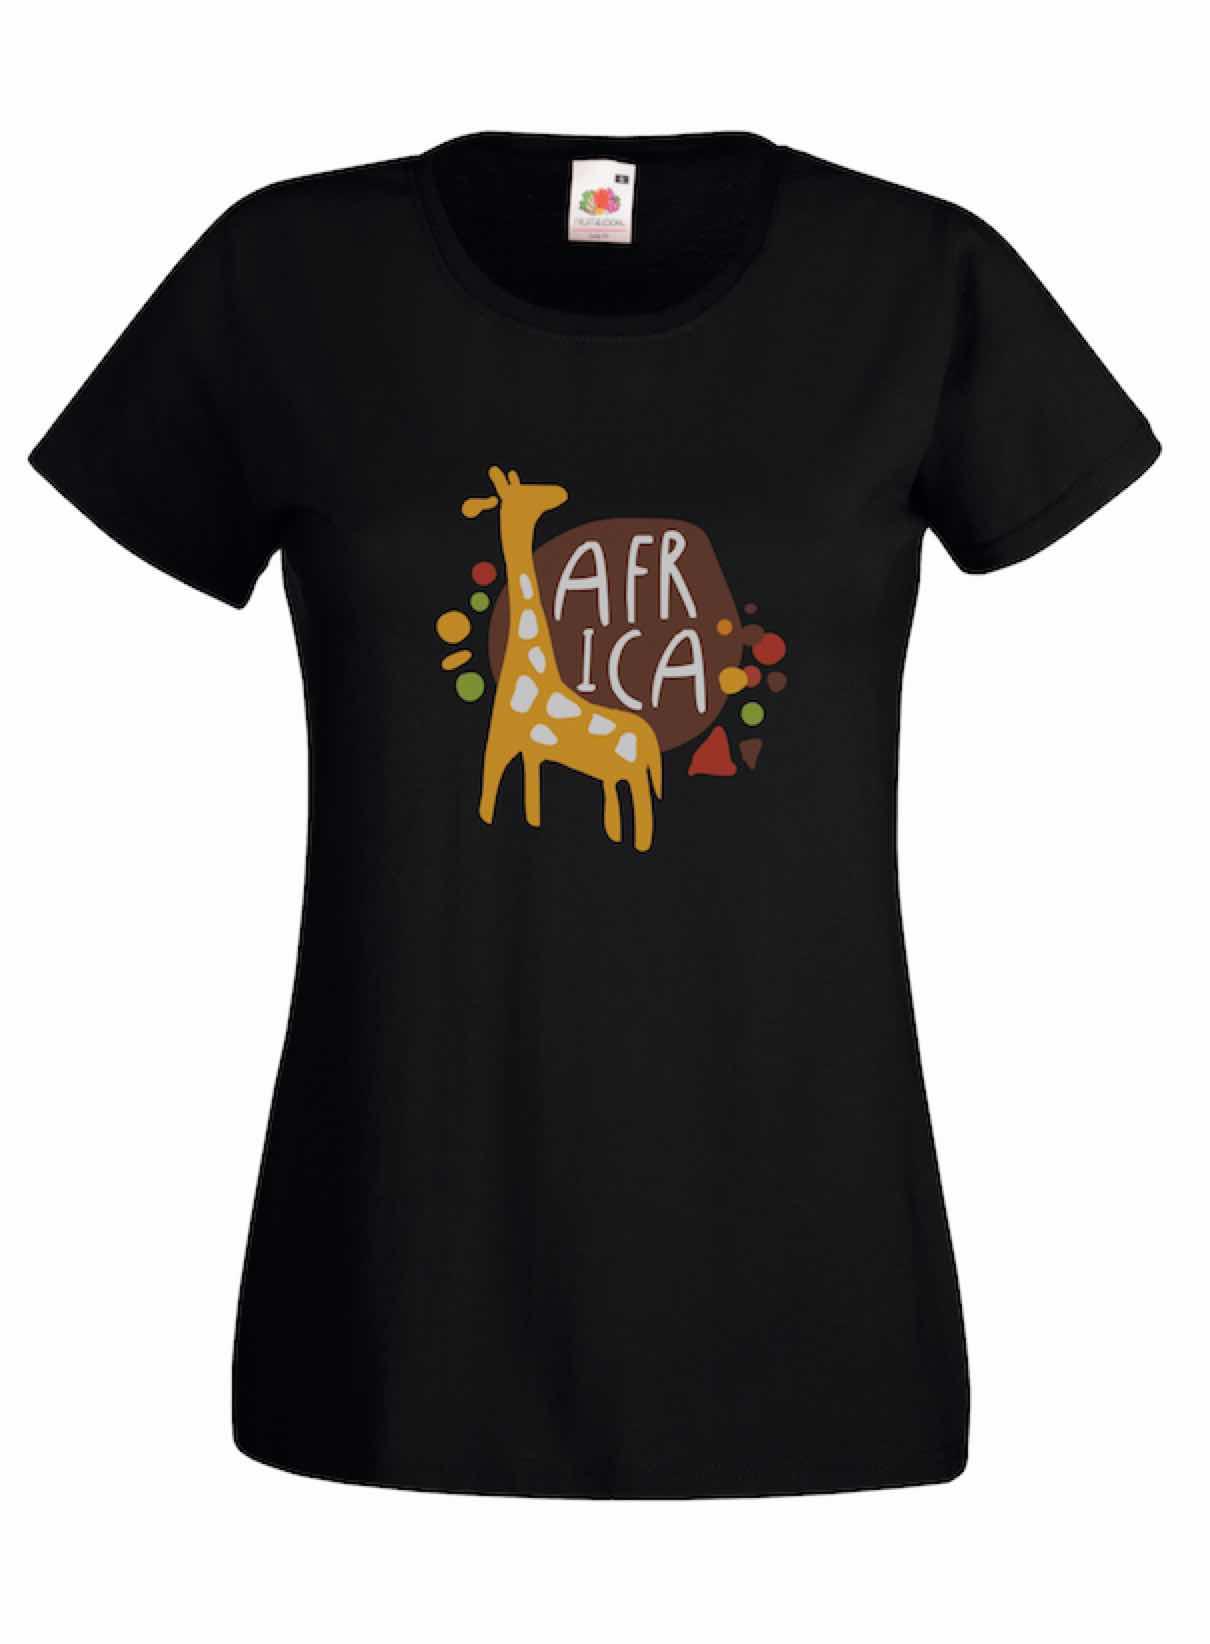 Giraffe design for t-shirt, hoodie & sweatshirt